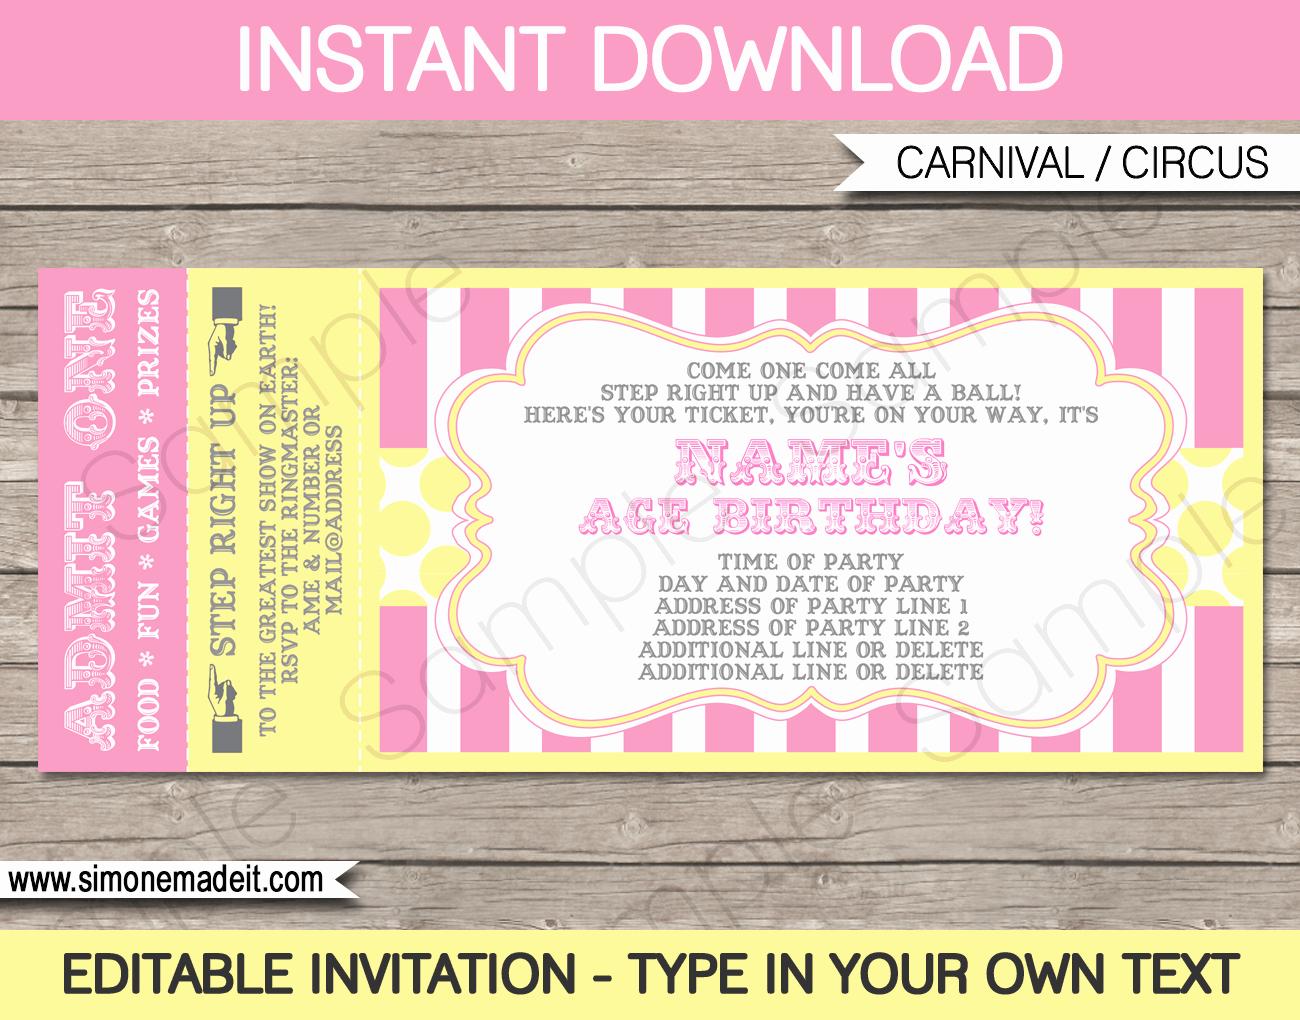 Circus Ticket Invitation Beautiful Carnival Birthday Ticket Invitation Template